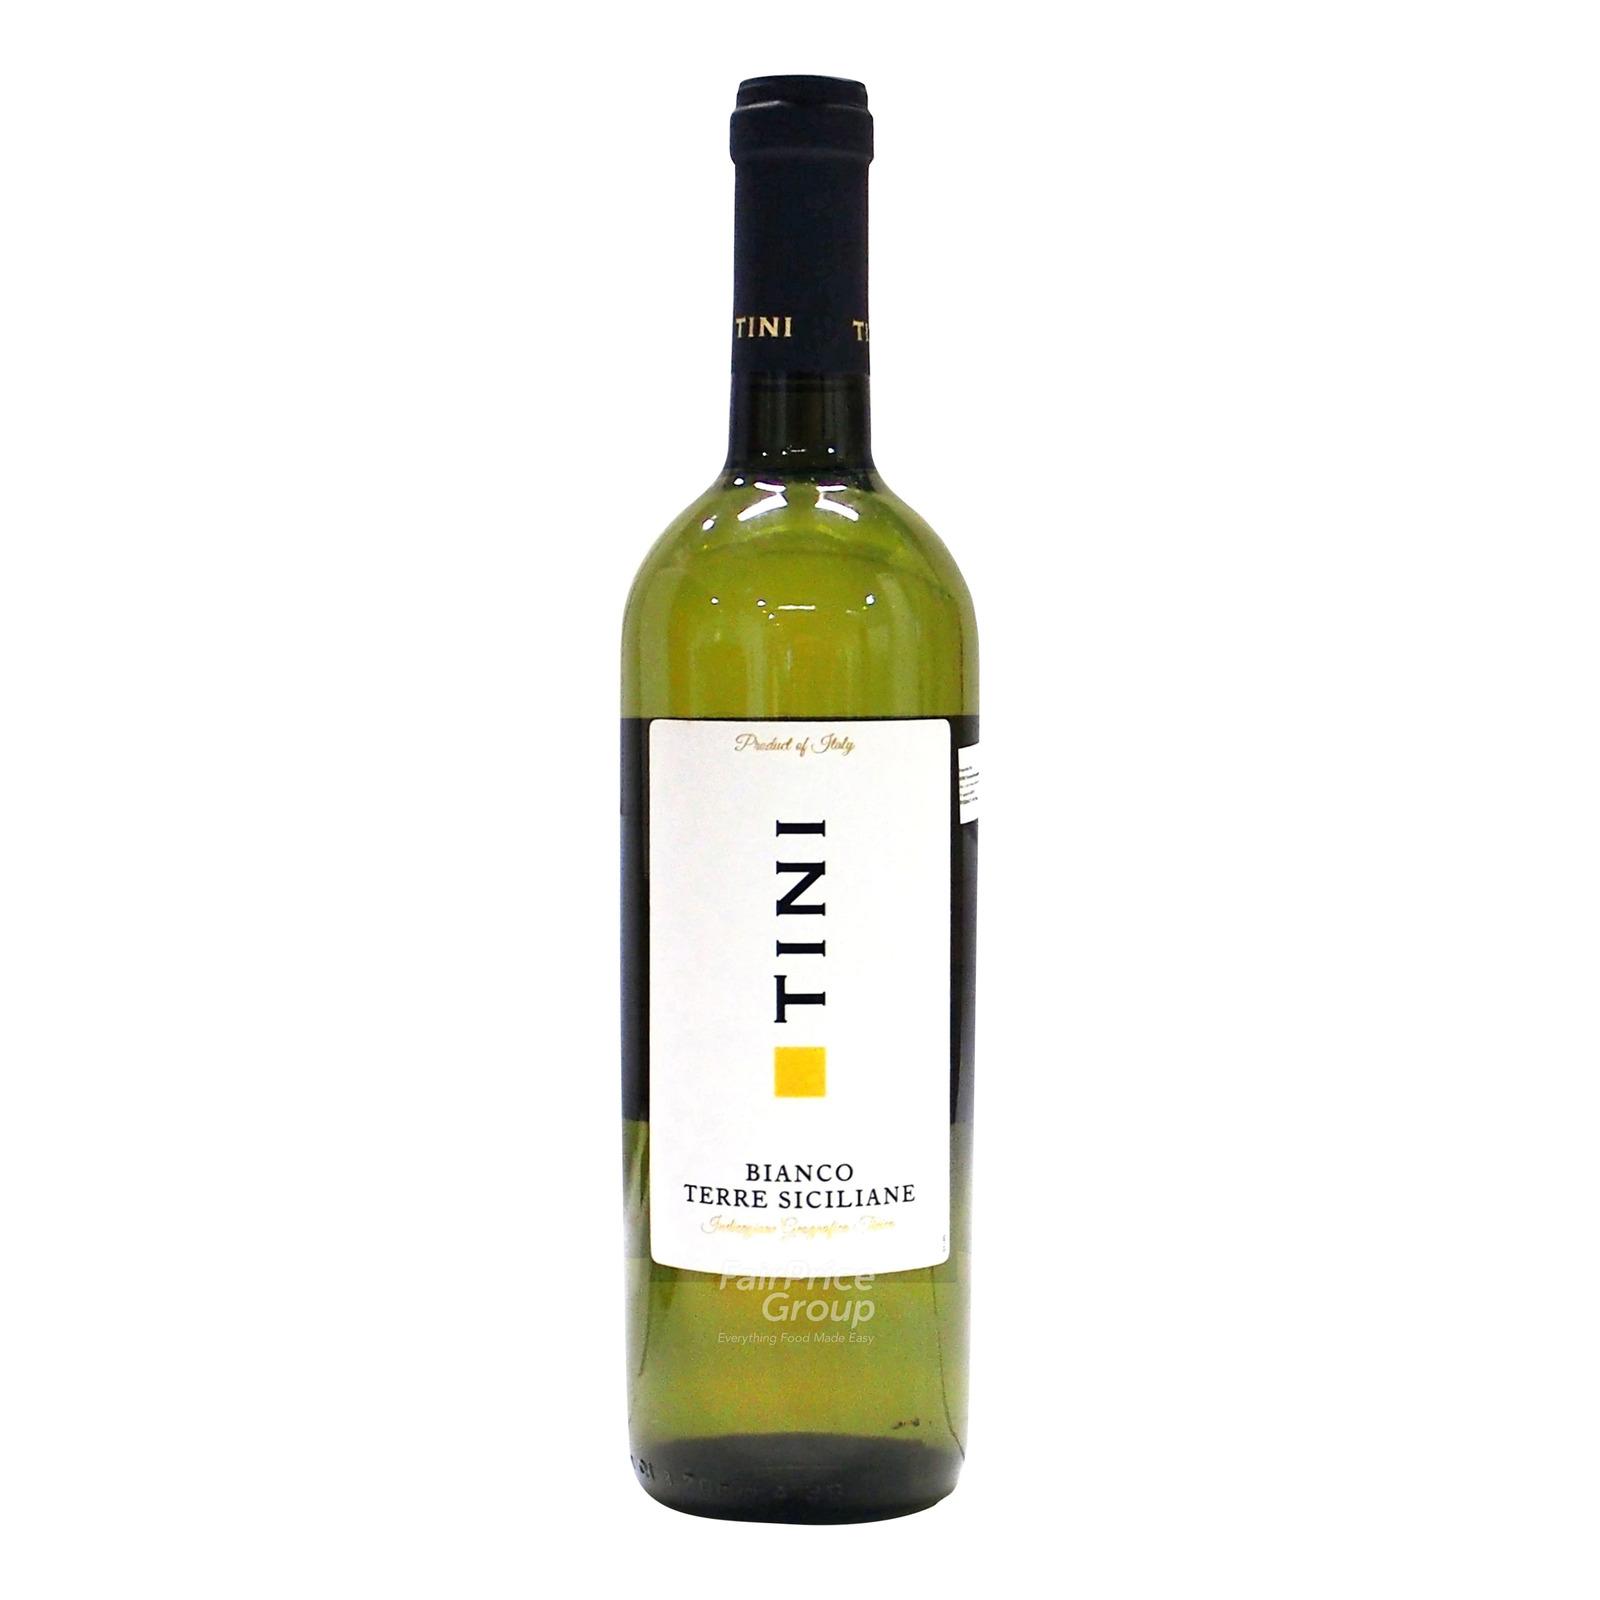 Tini White Wine - Bianco Terre Siciliane IGT